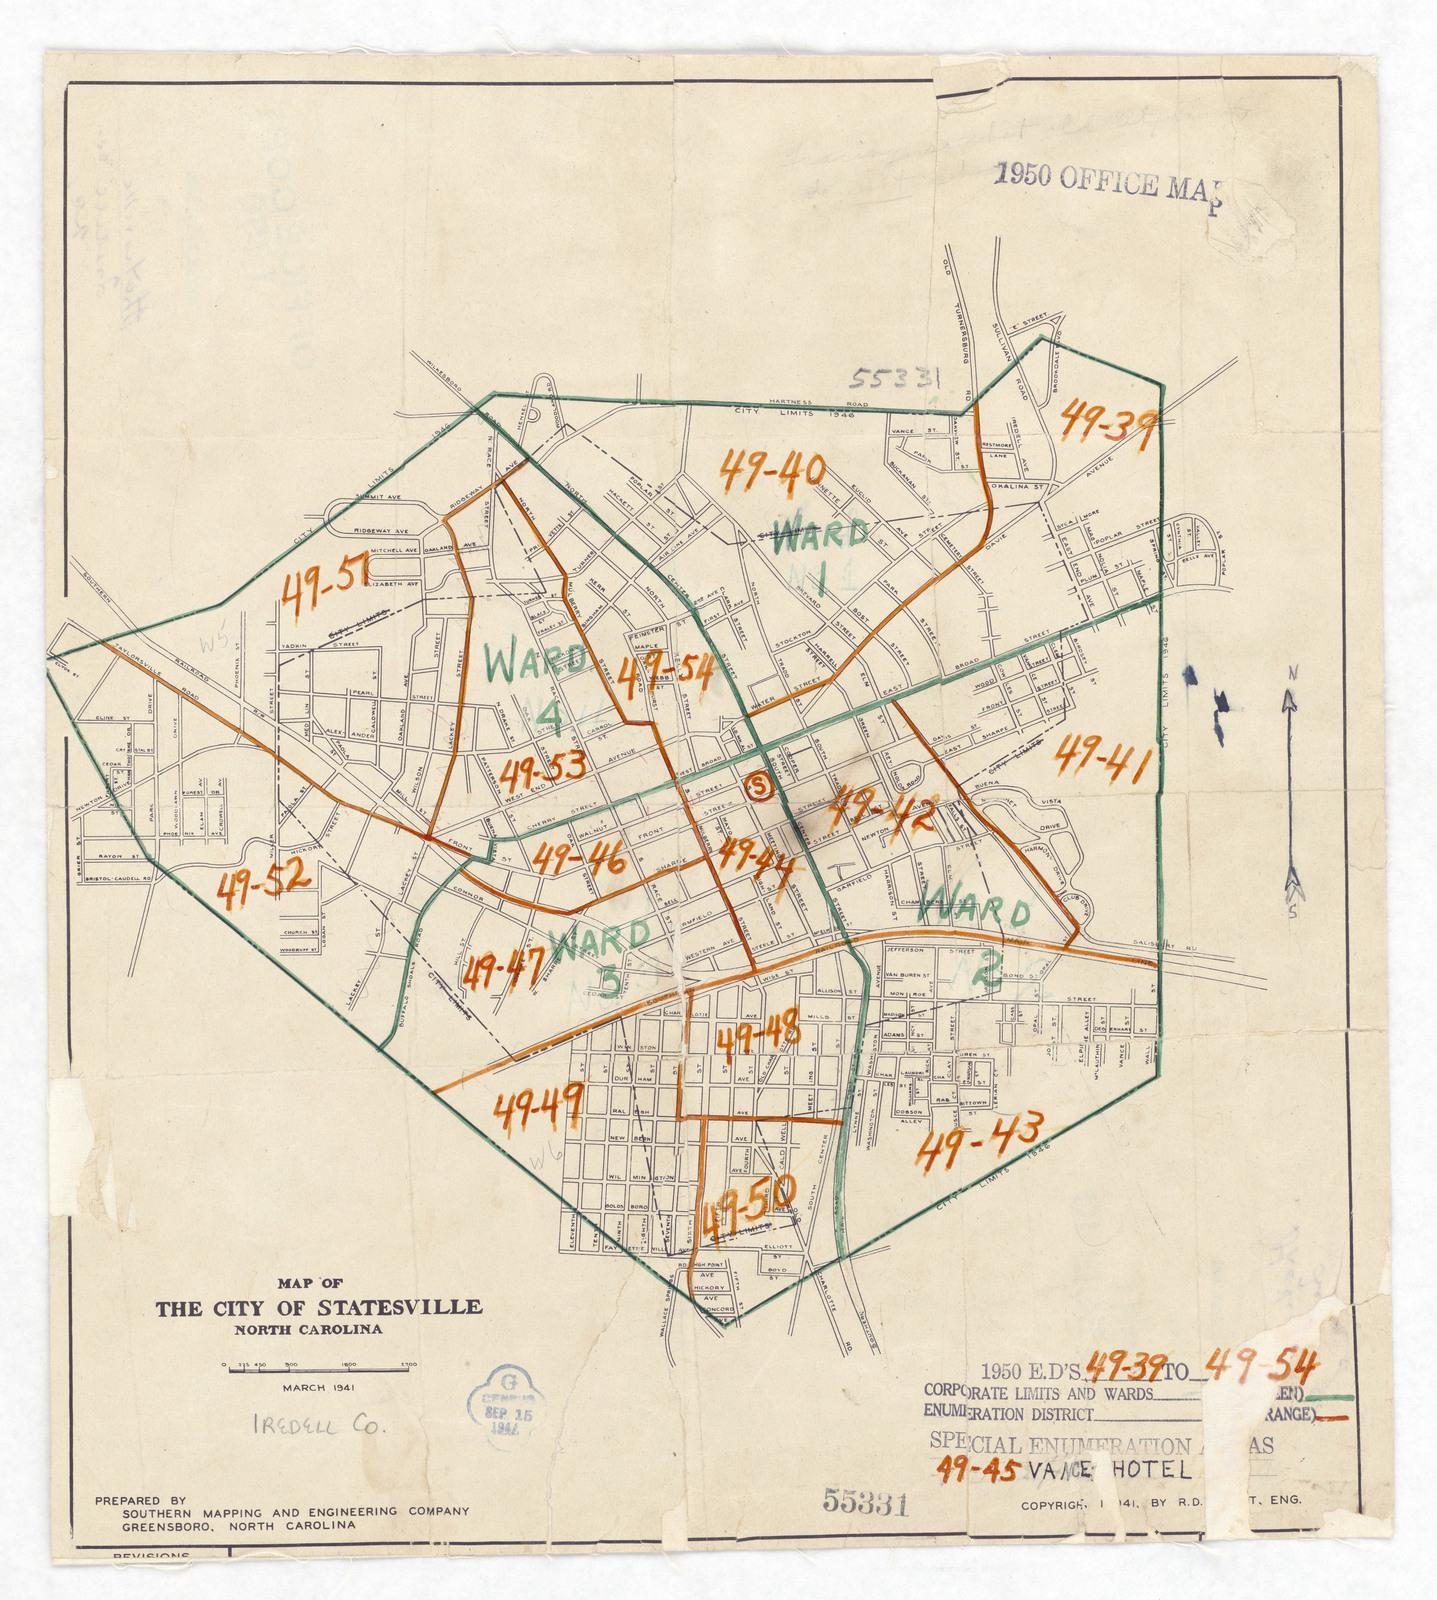 1950 Census Enumeration District Maps North Carolina Nc - North-carolina-map-us